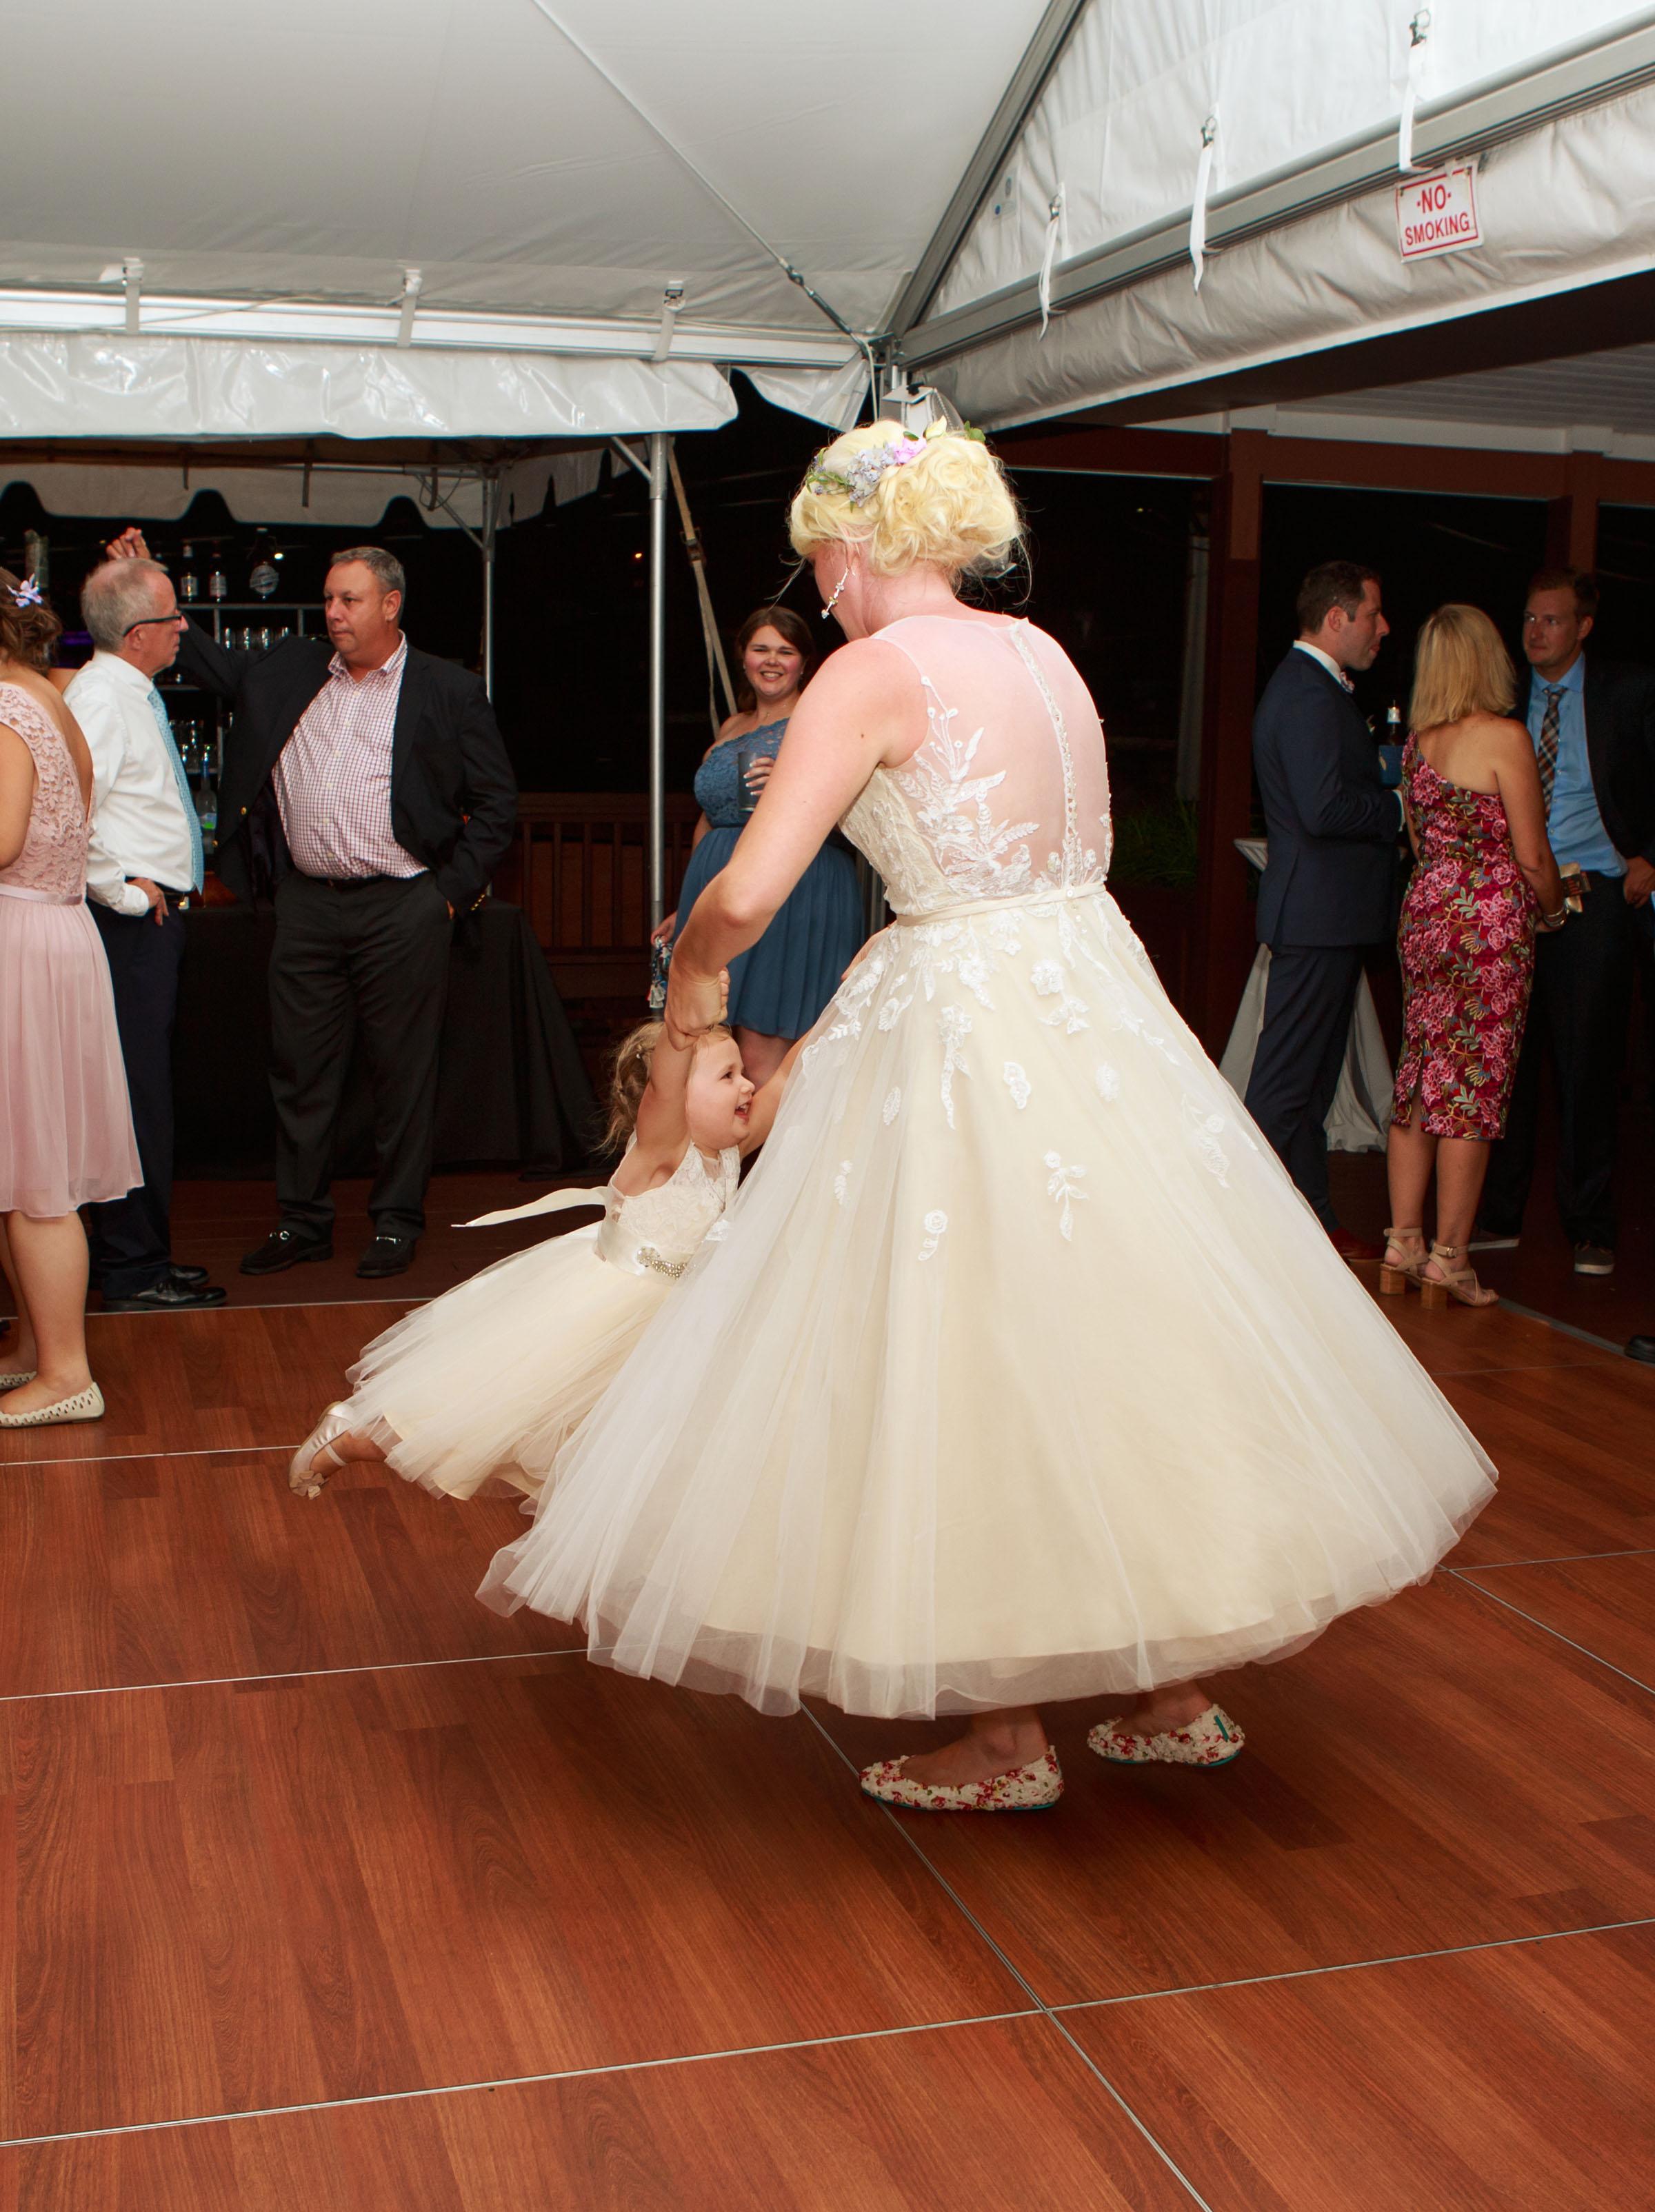 128-South-Wedding-Wilmington-NC-Photographer-Reception-130.jpg